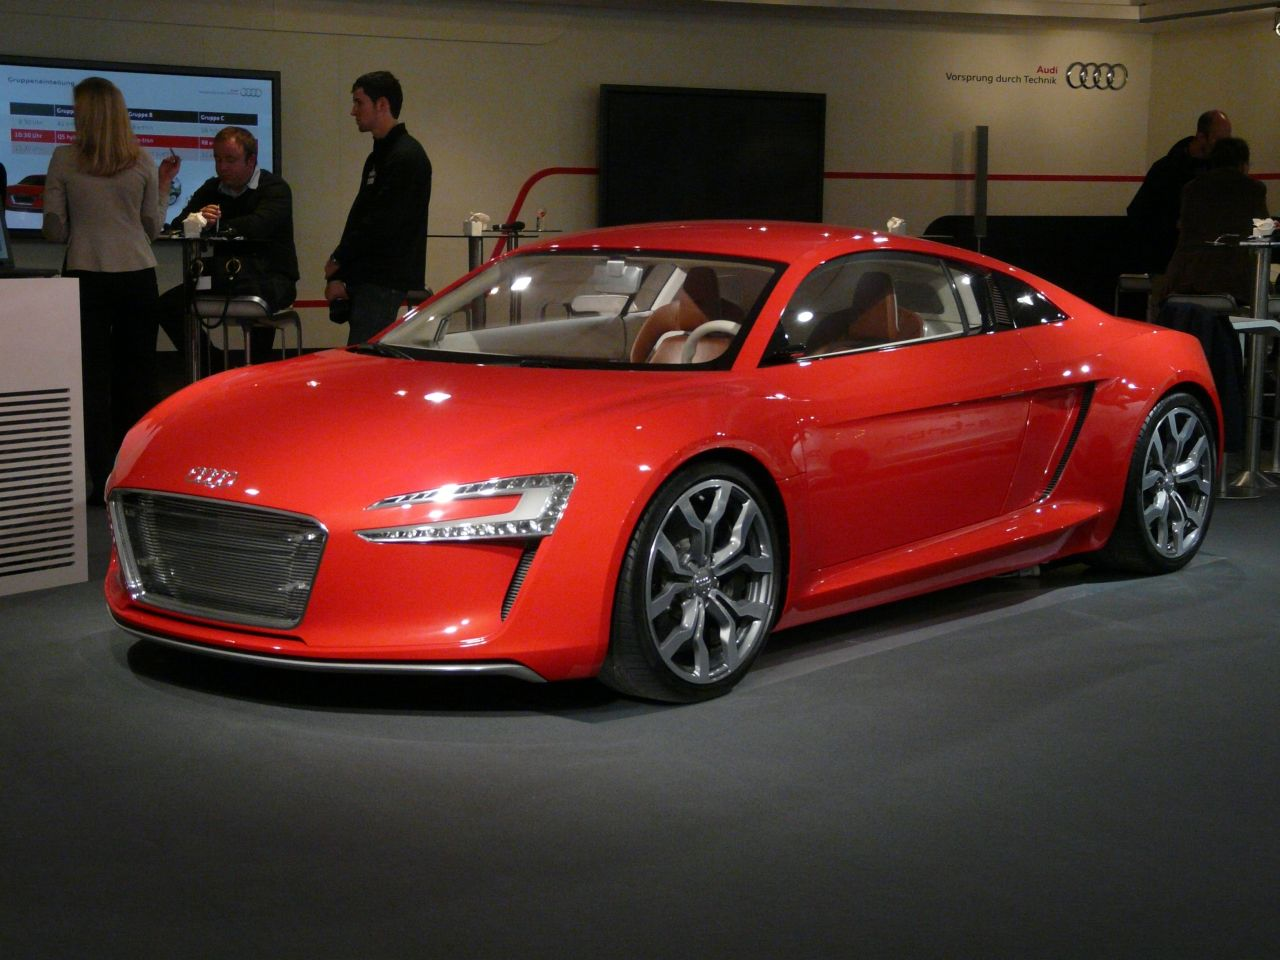 2013 Audi R8 E-tron Not For Production